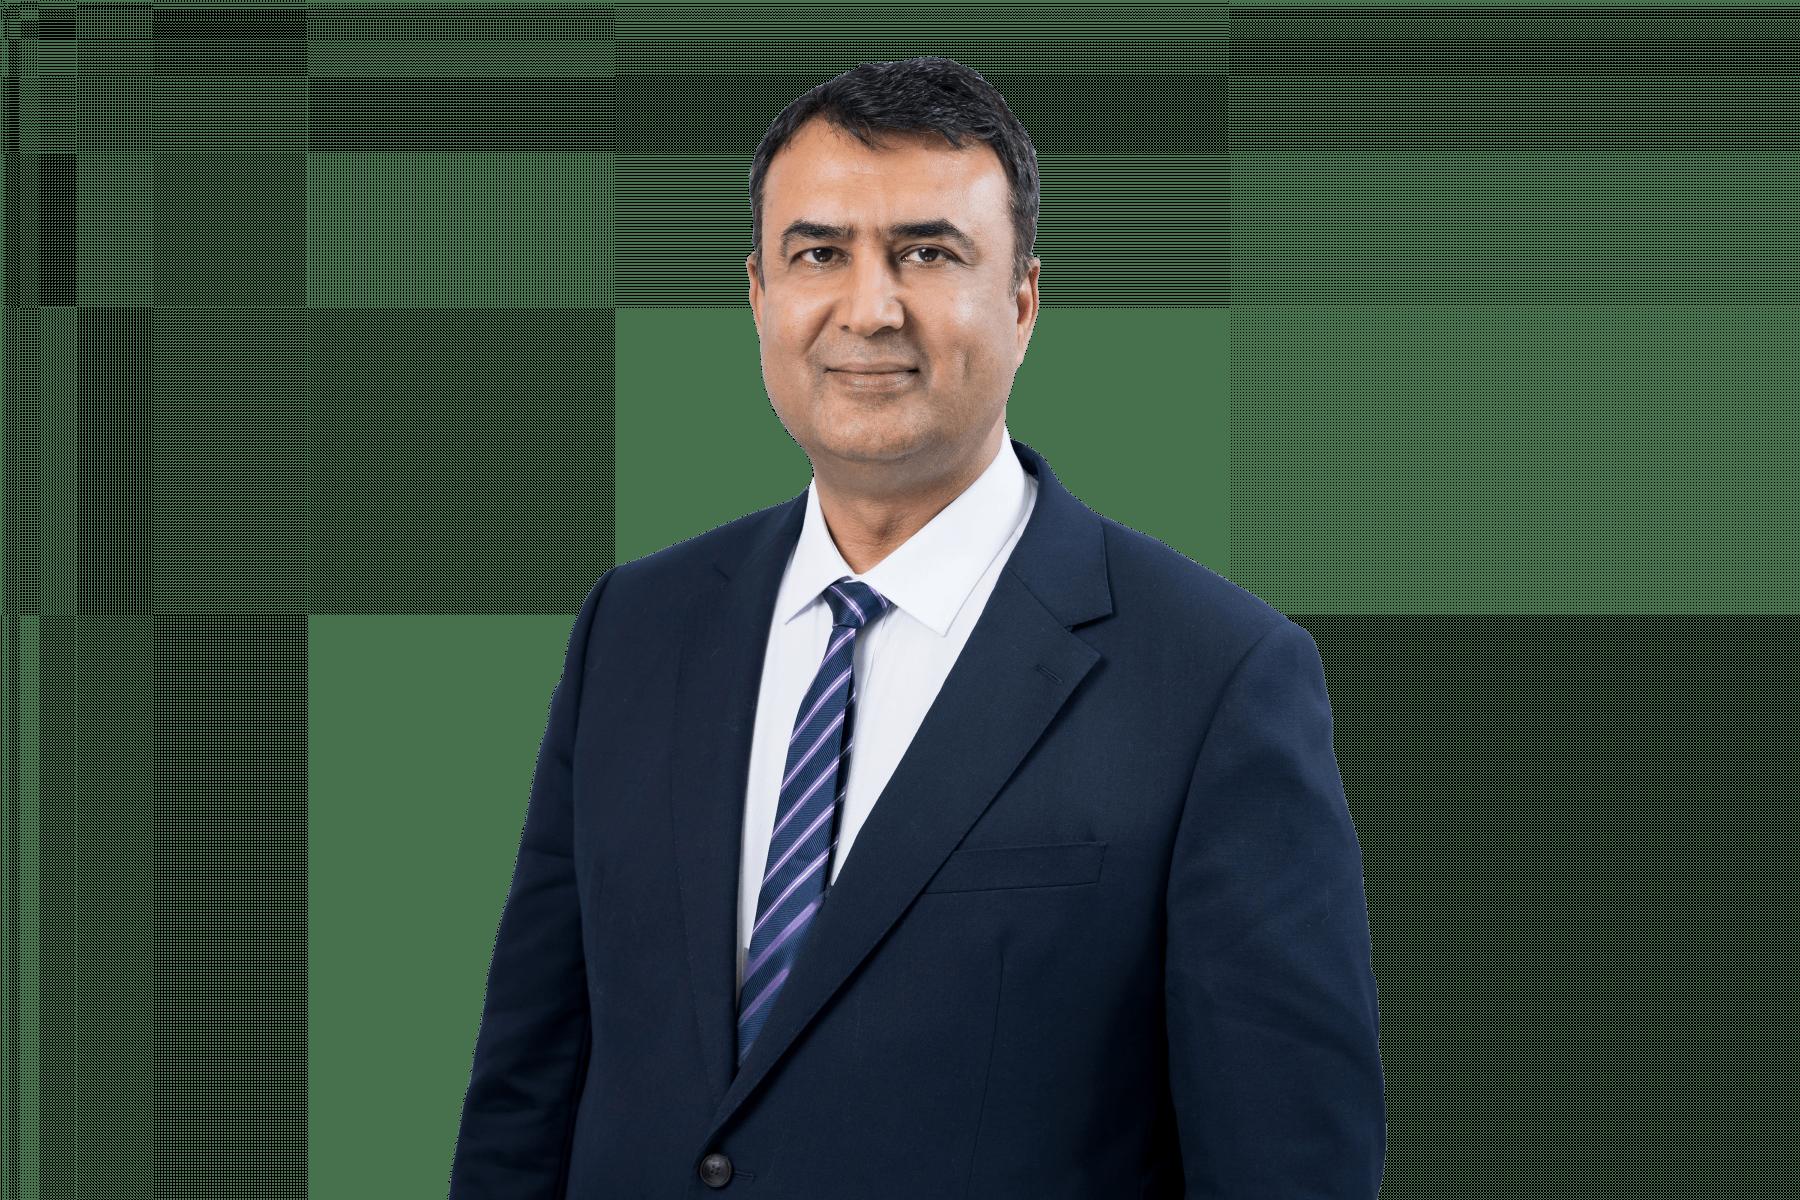 Ijaz Ahmad | Head of Conveyancing Department | Farani Taylor Solicitors